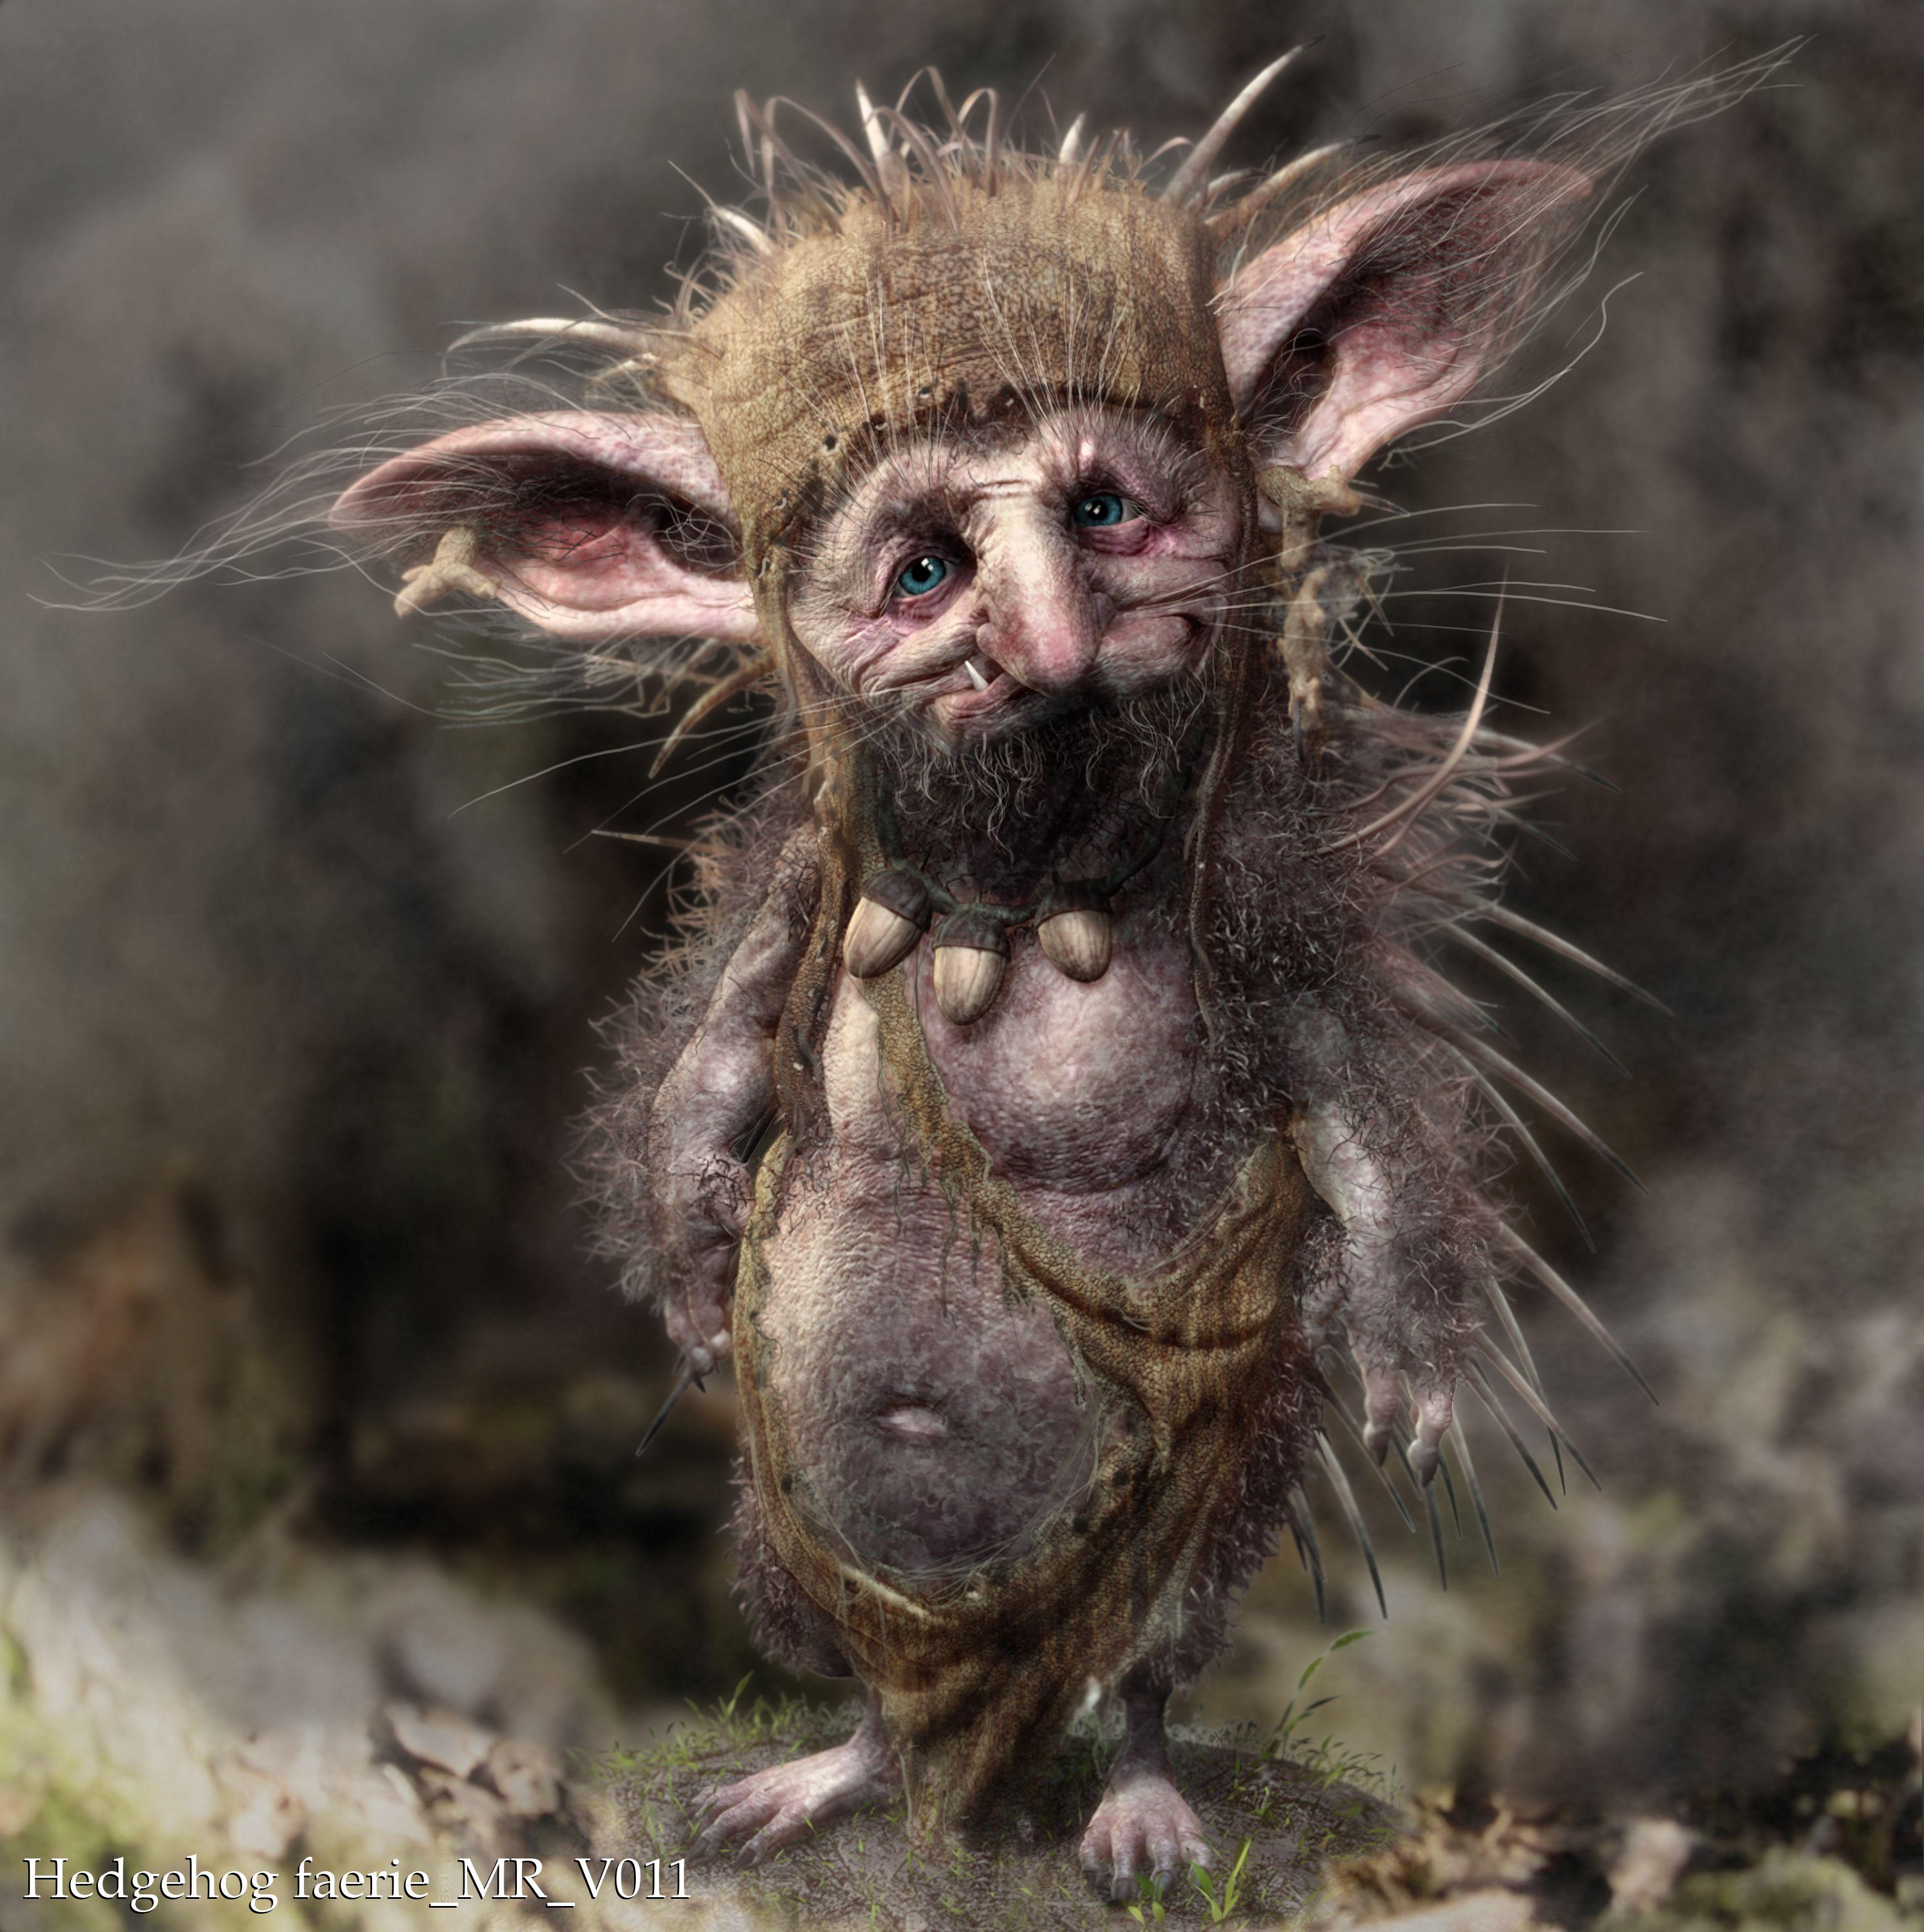 Hedgehog Faerie Malefica Imagenes Conceptuales Fairy